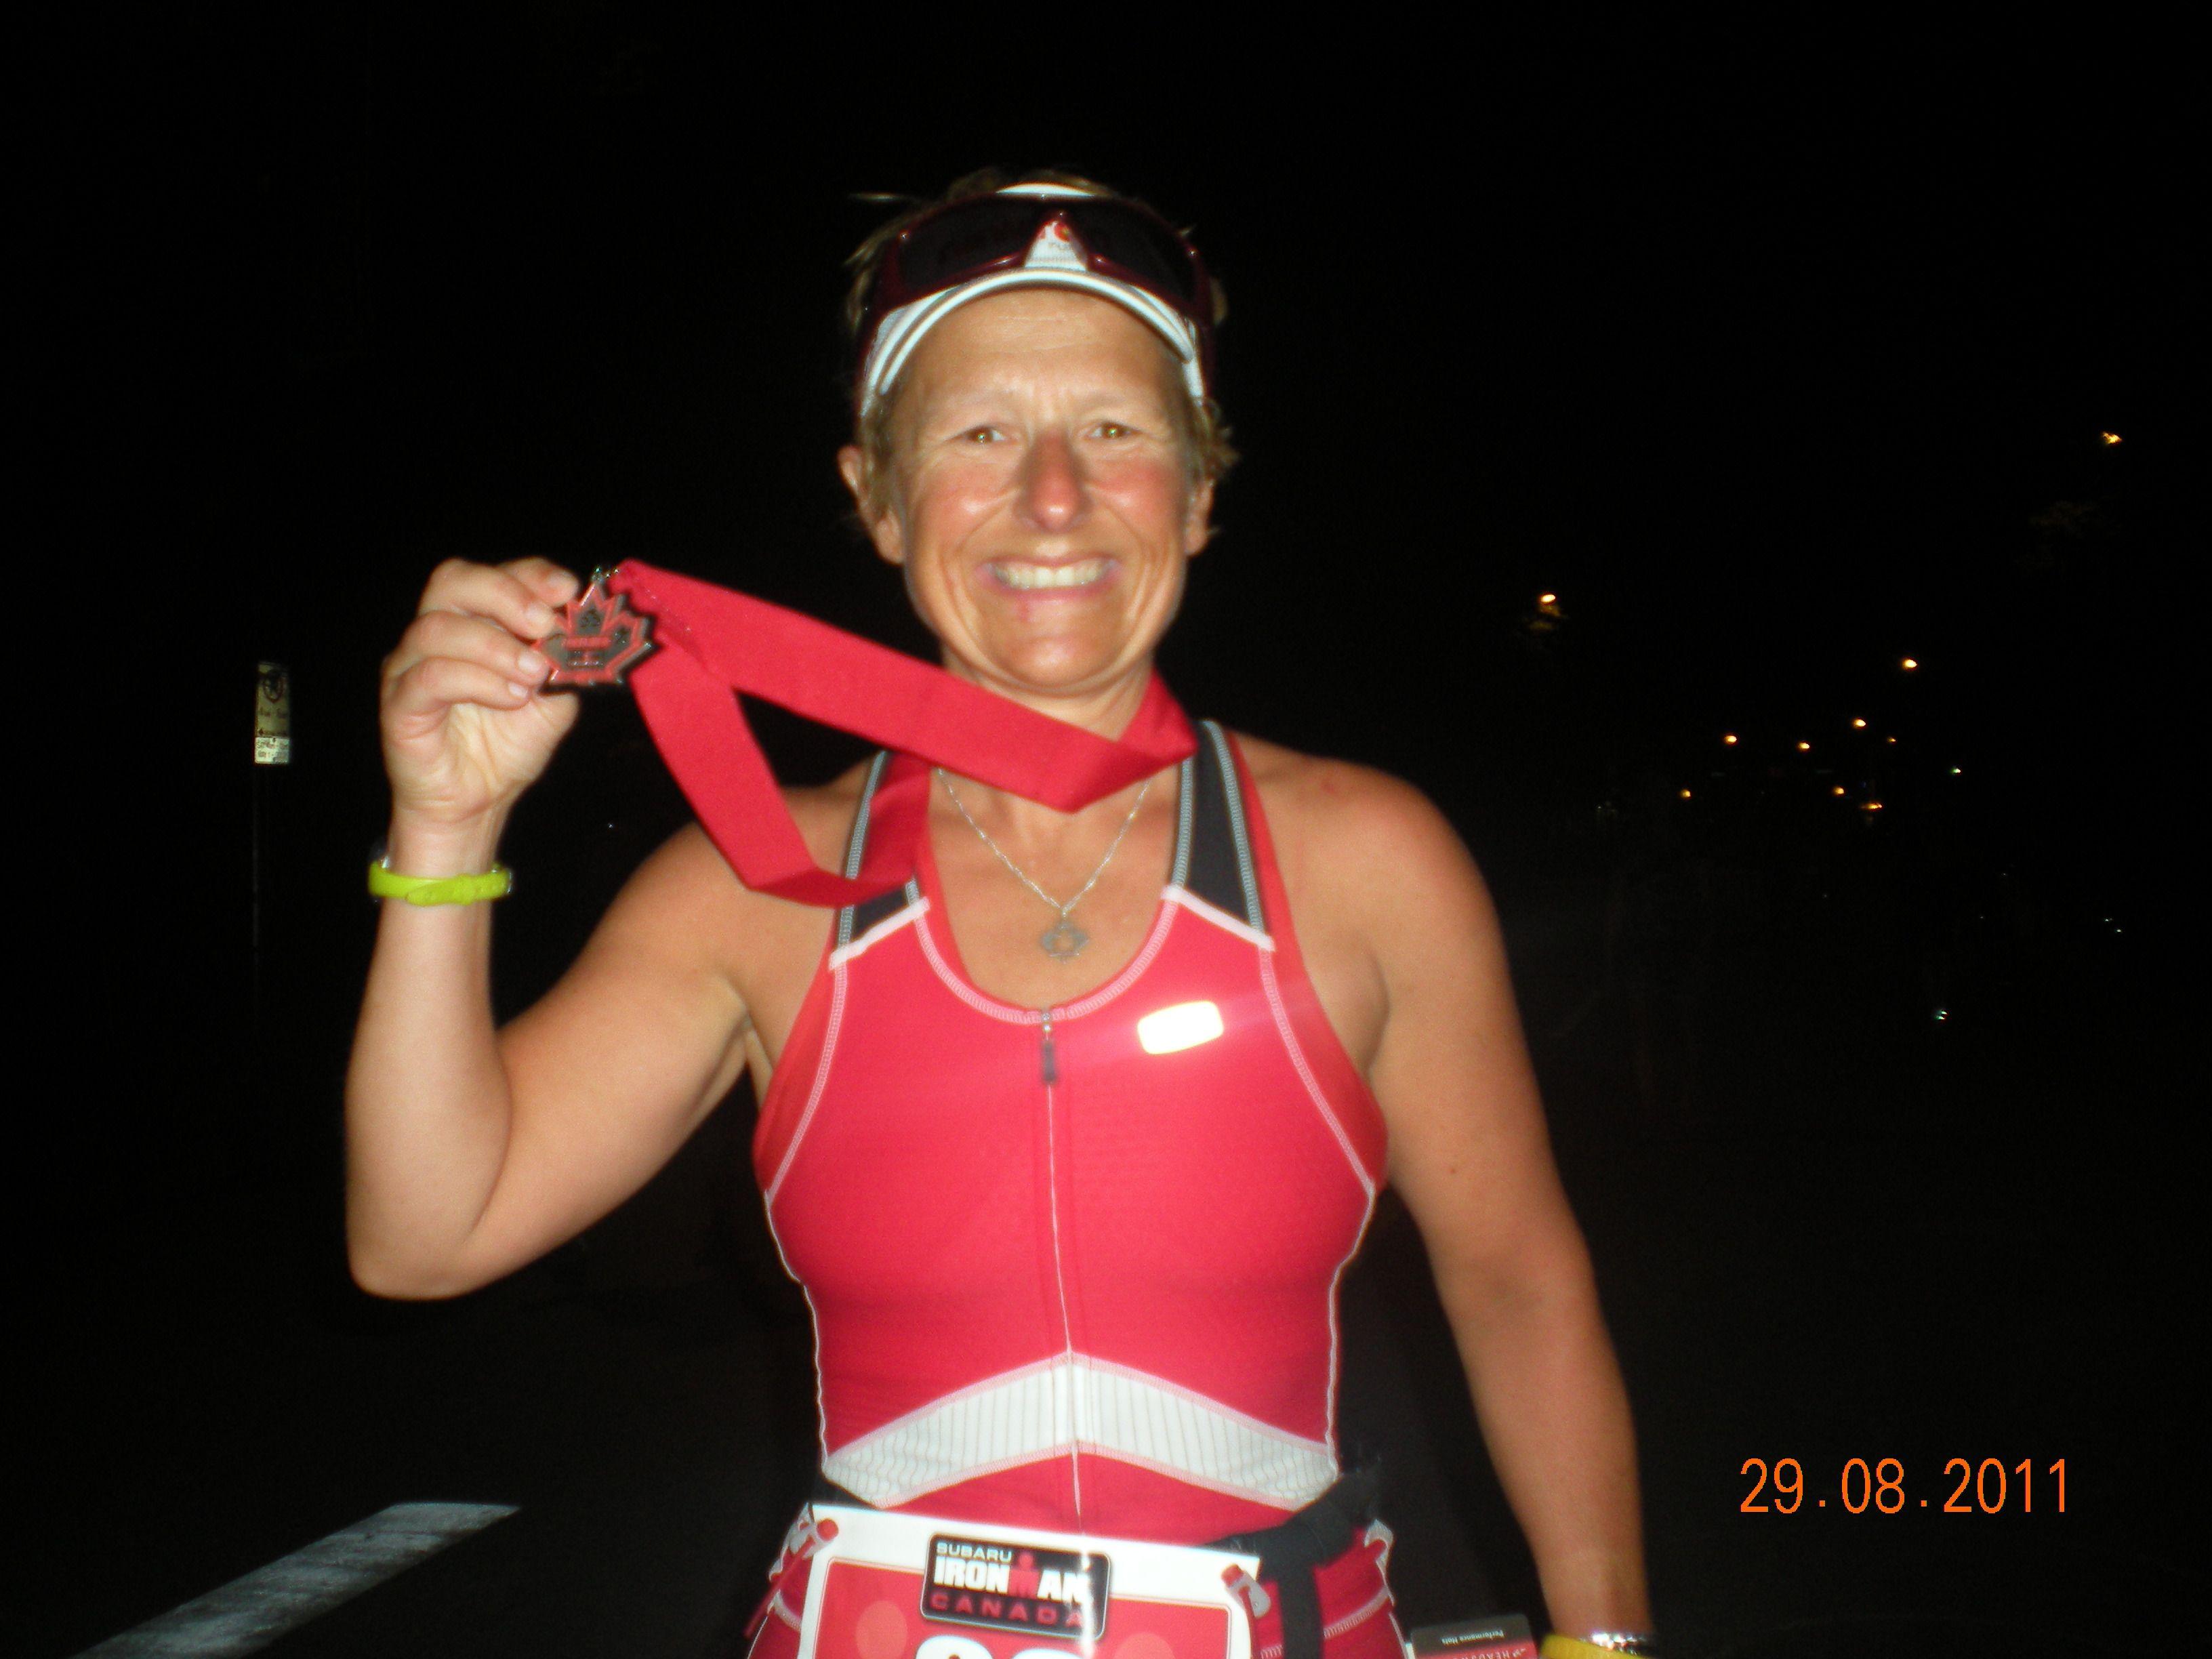 2011 Finisher Sports bra, Swimwear, Fashion